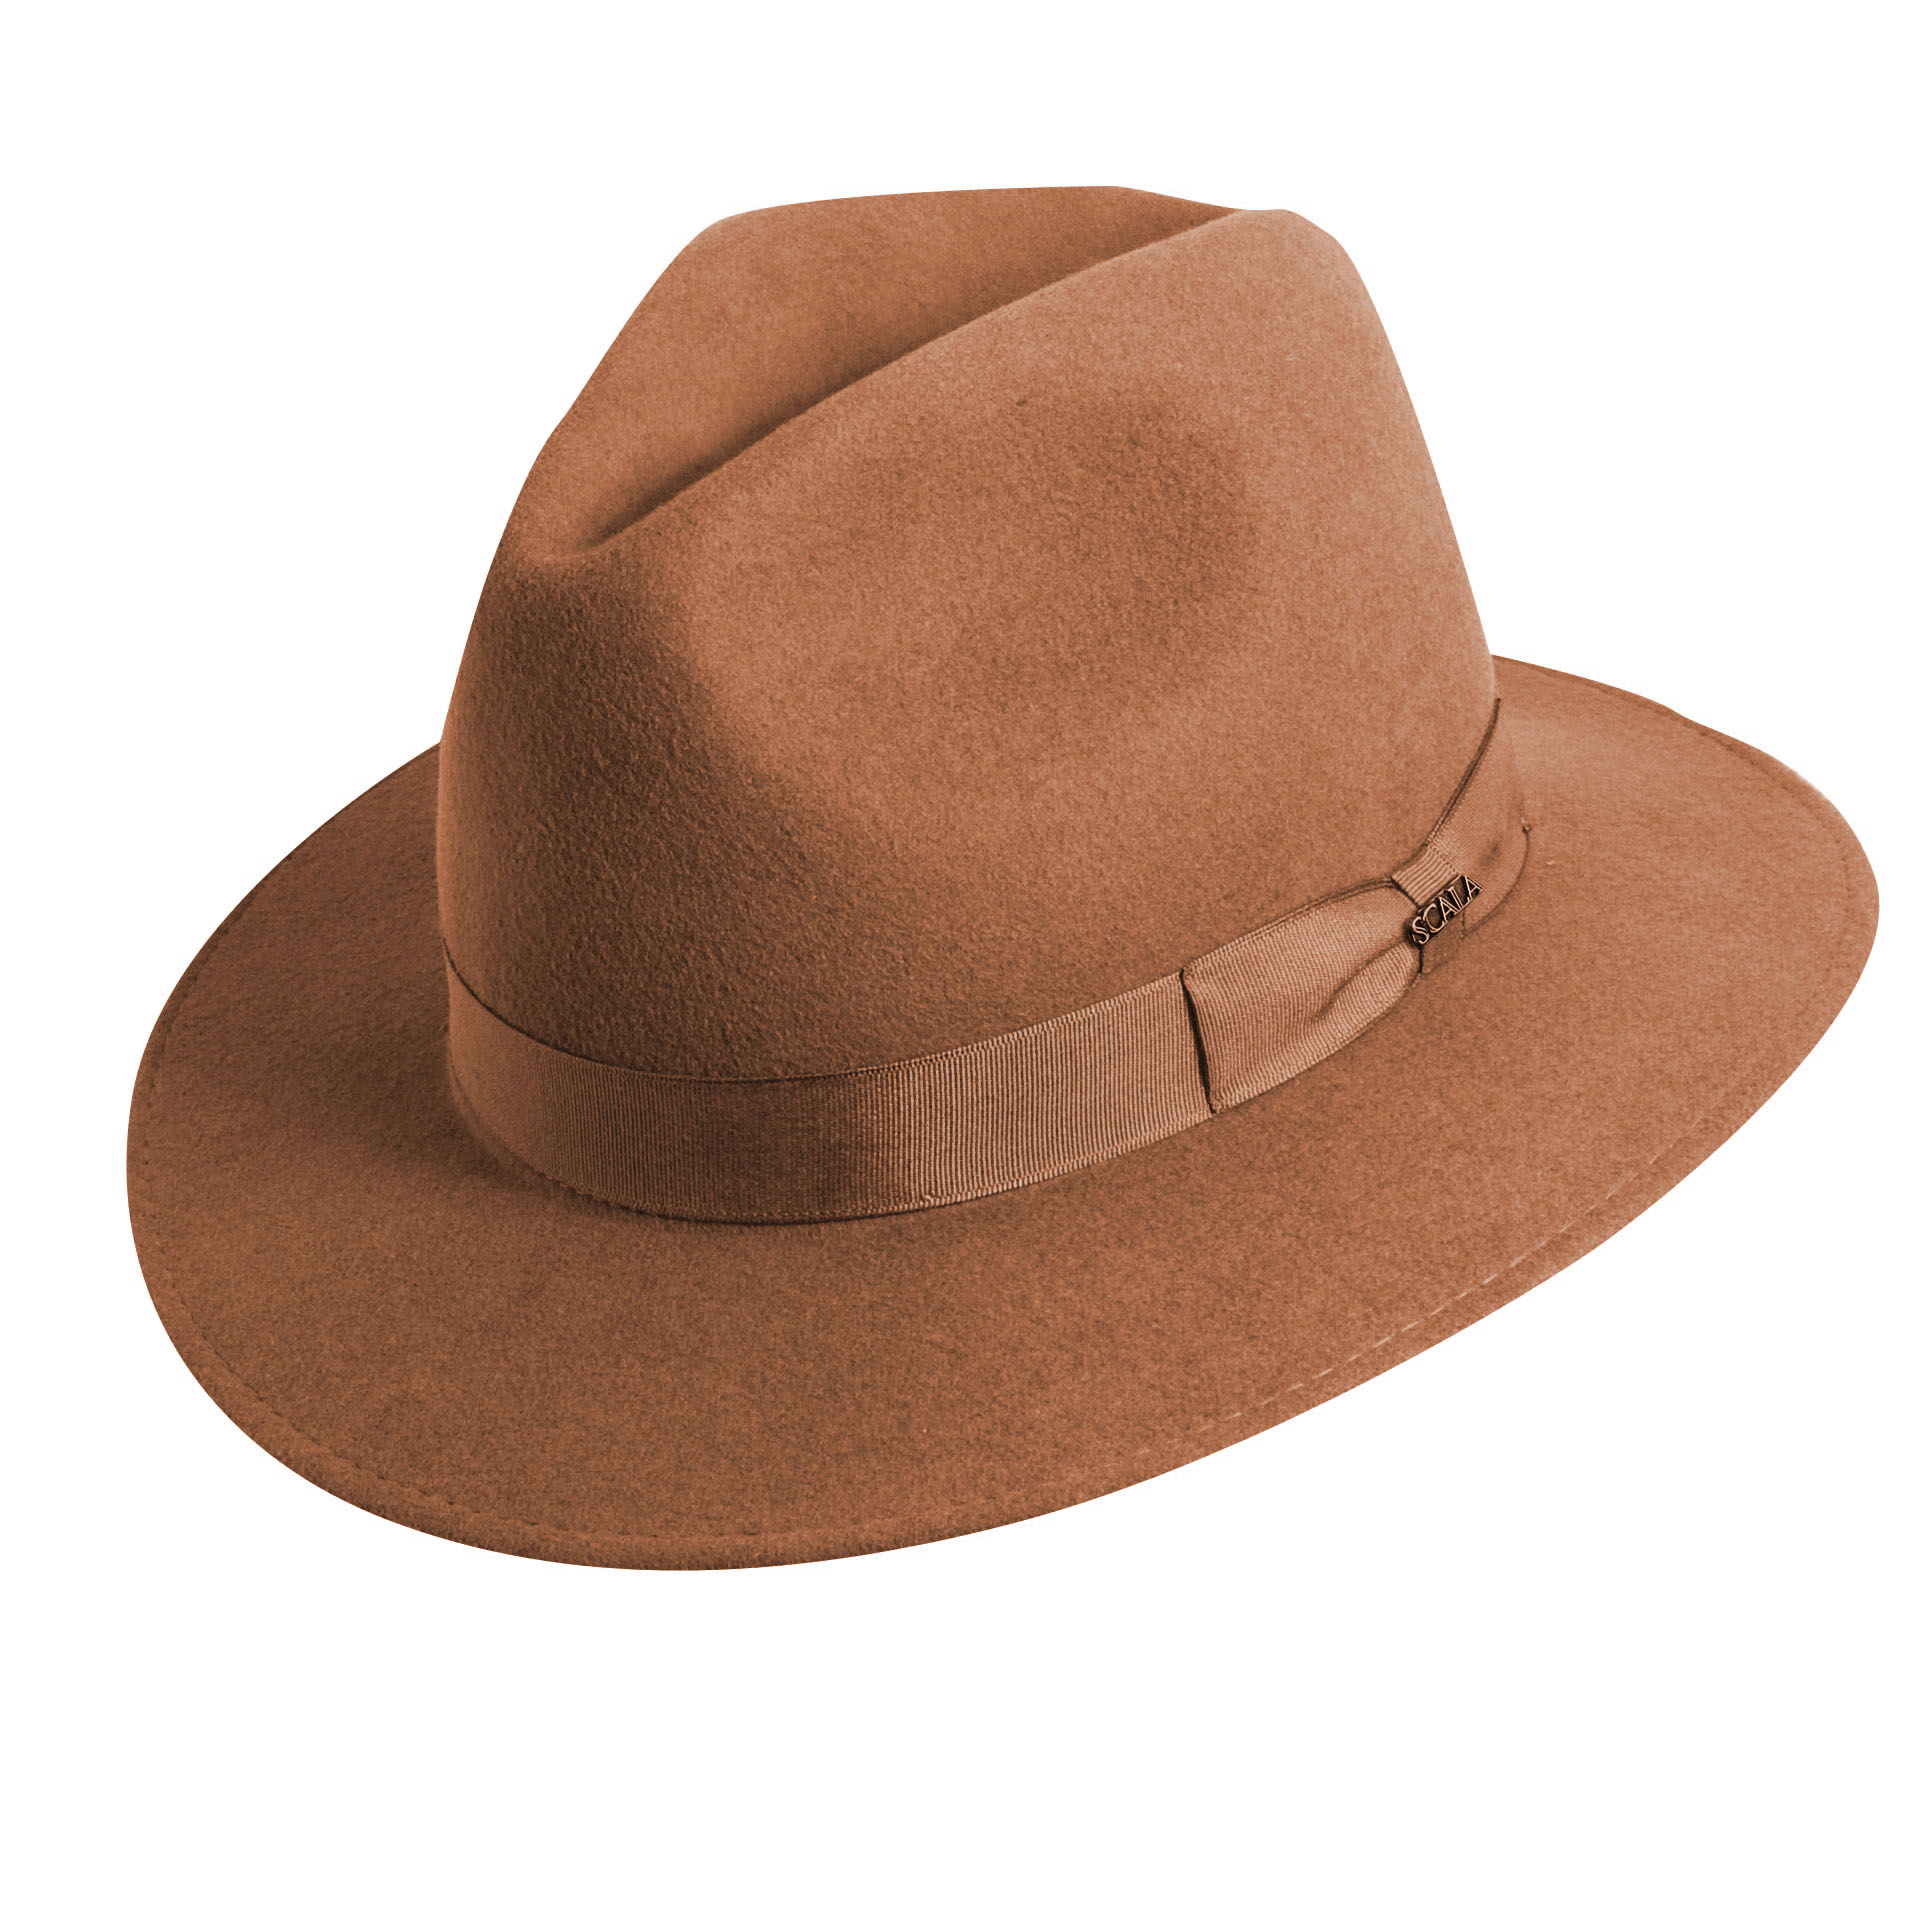 5f35a5dcf3b Wool Felt Safari Hat with Grosgrain Trim Pecan